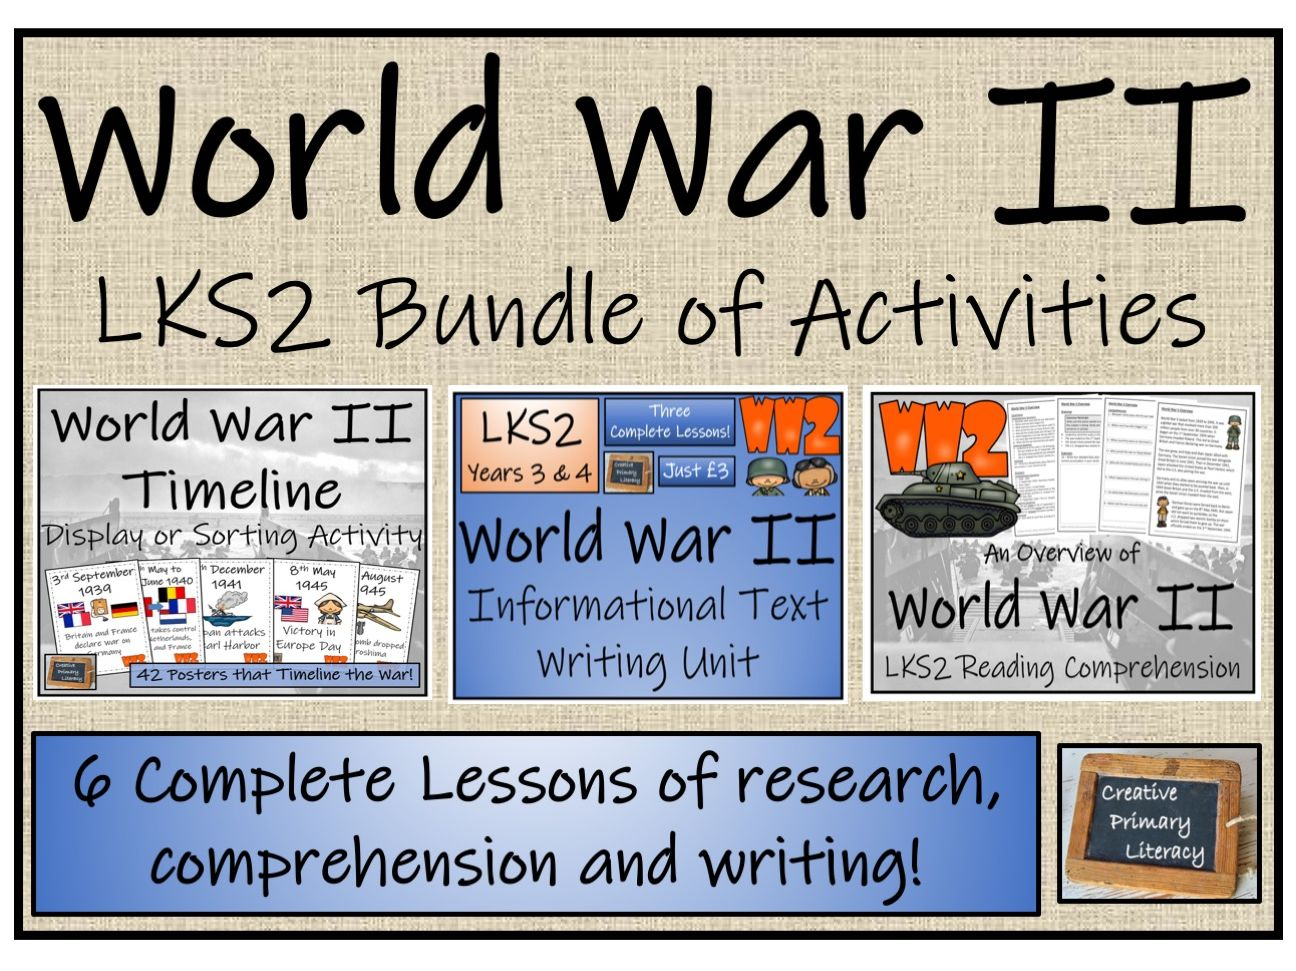 LKS2 World War II - Display, Sorting, Reading Comprehension & Writing Bundle